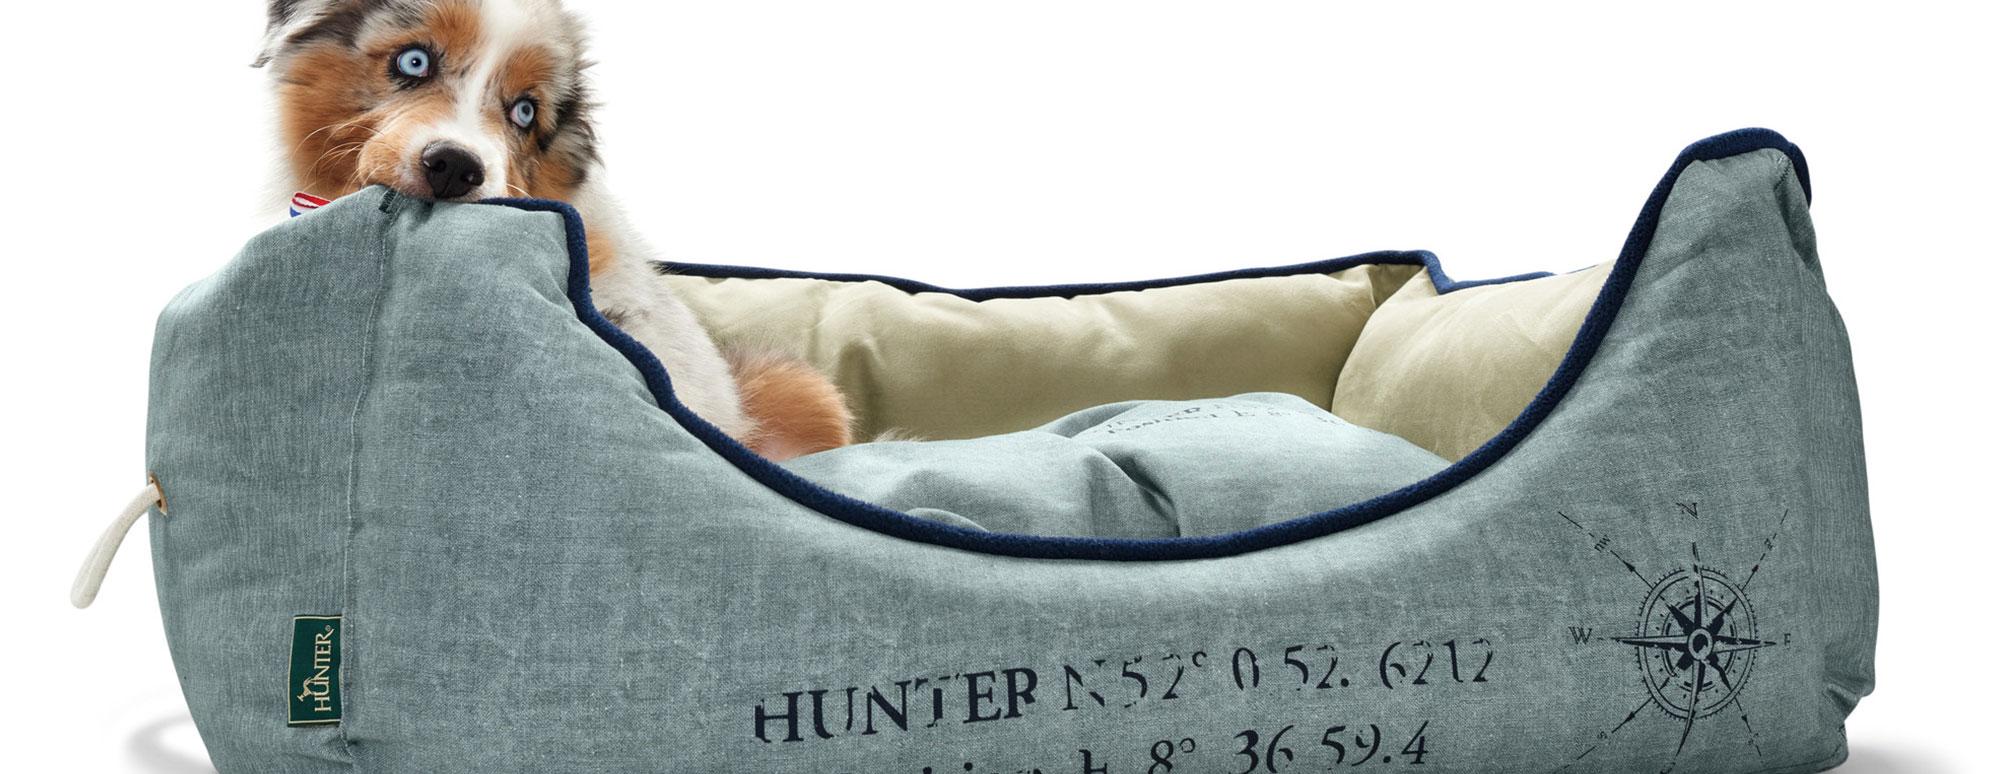 Hunter List Hundezubehör, Bild 7